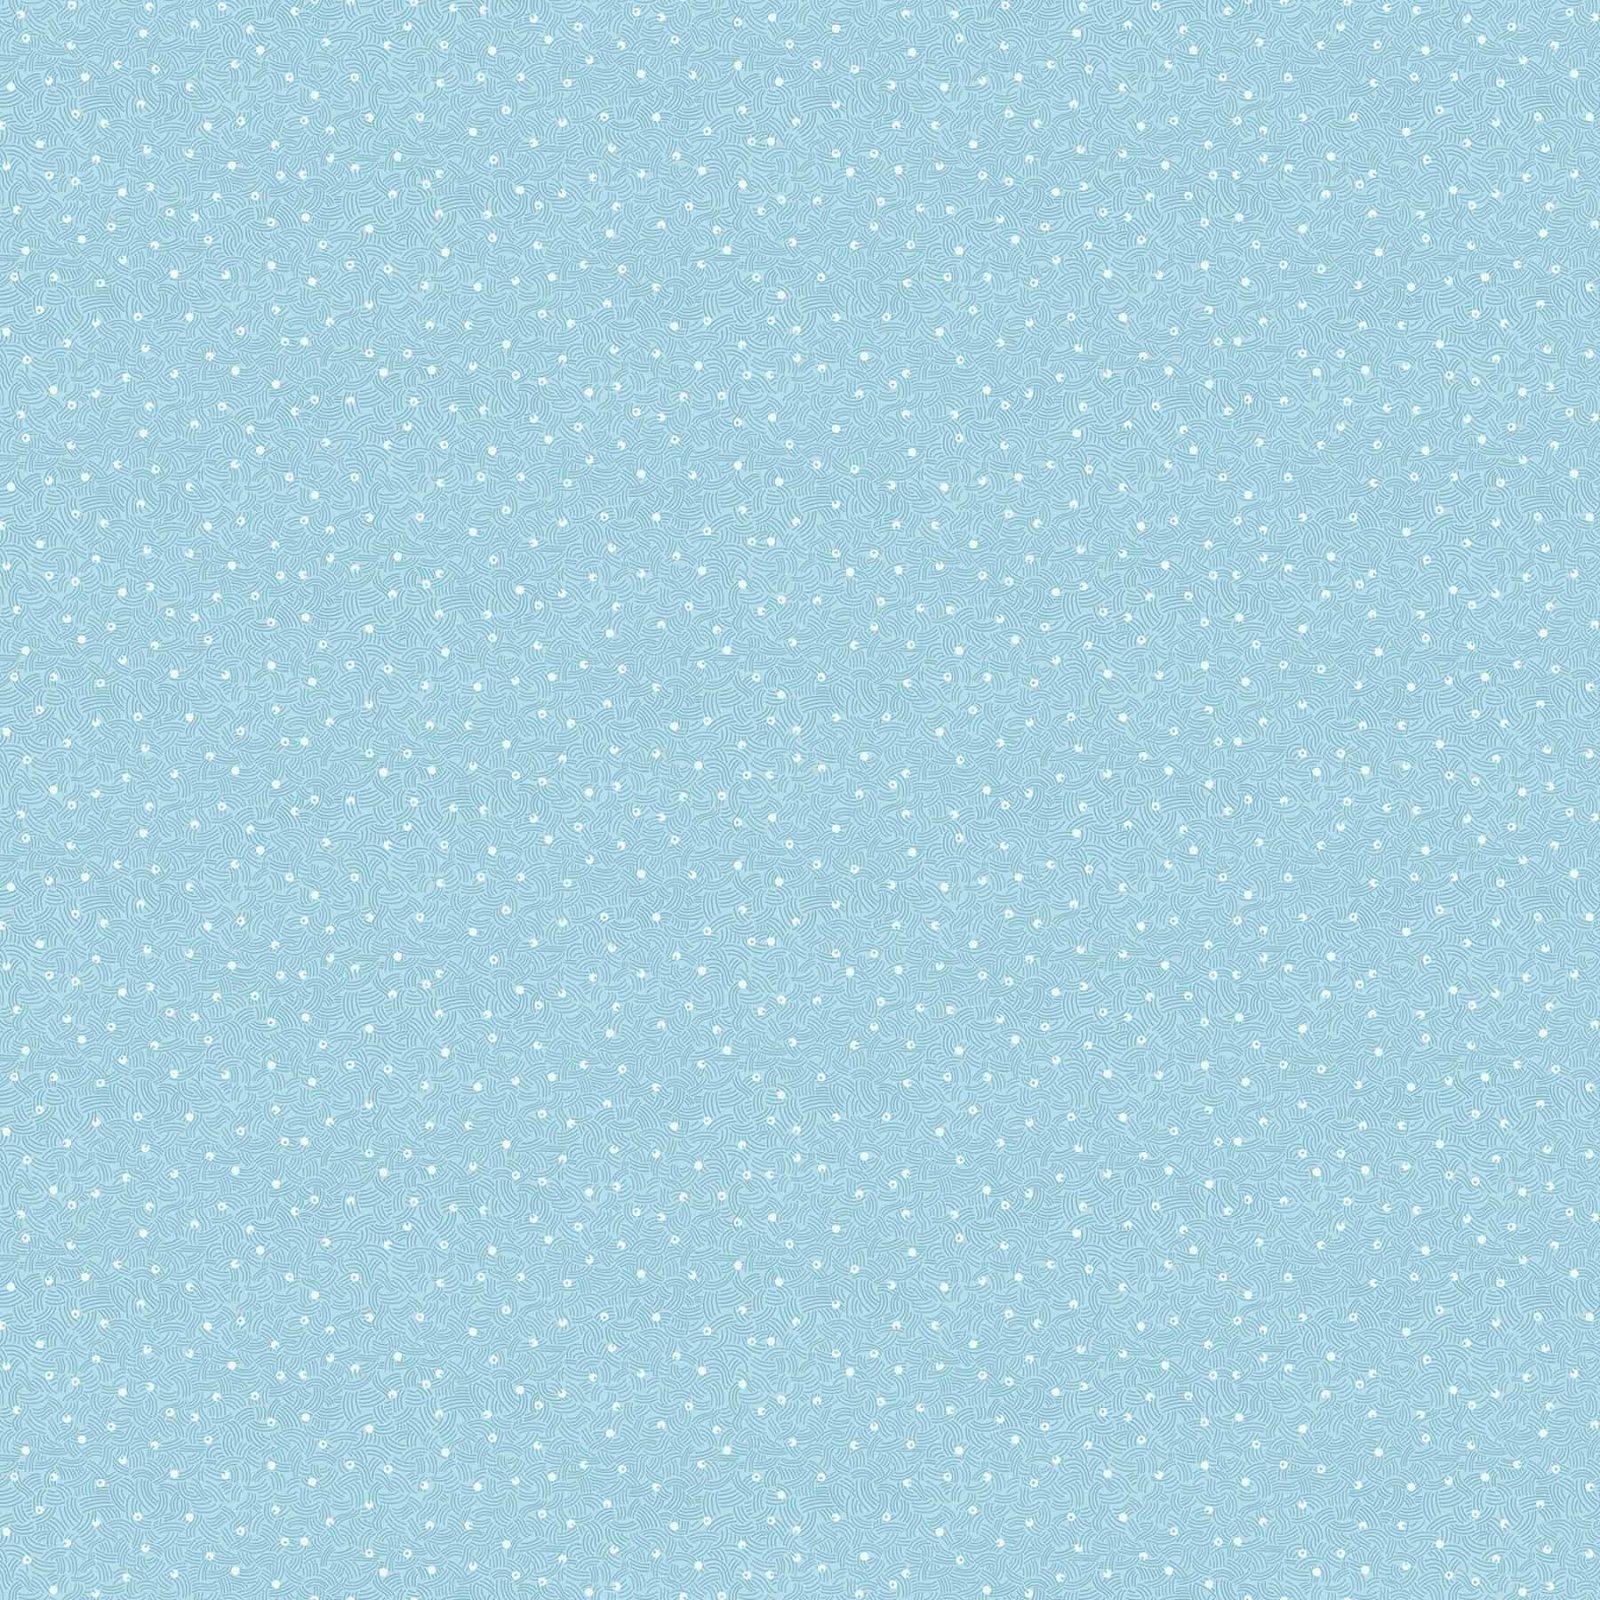 Elements in Light Blue